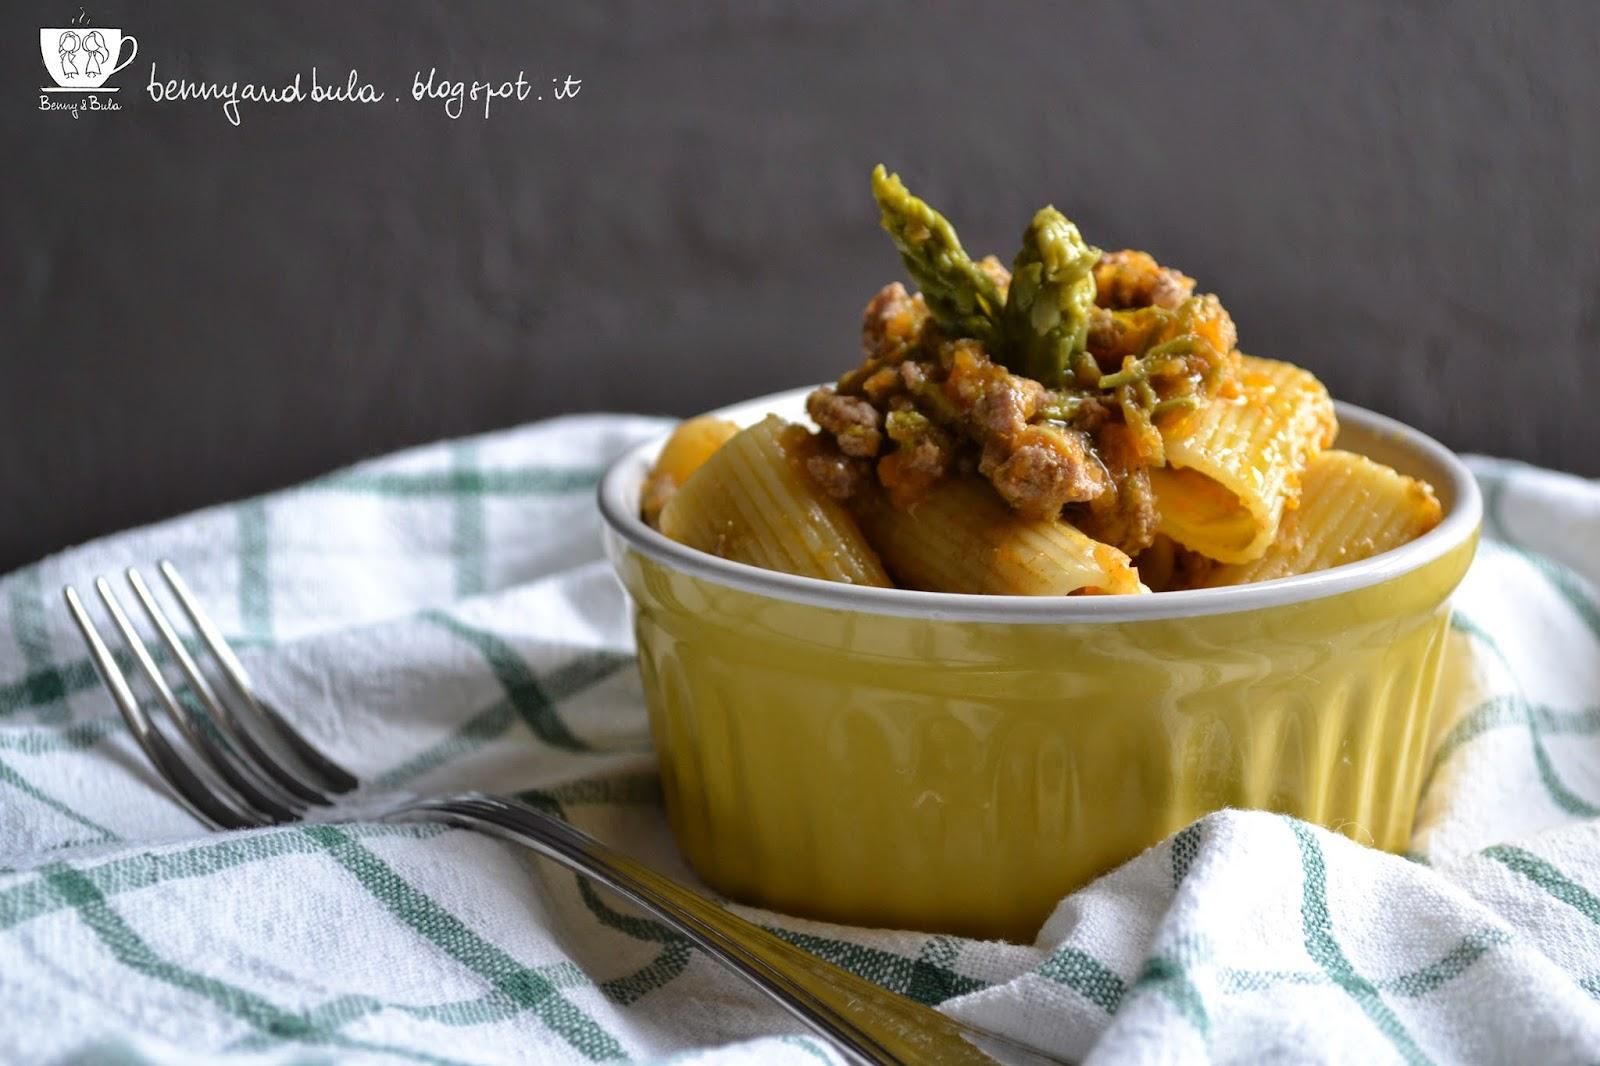 ricetta rigatoni al ragù con verdure/ vegs ragout pasta recipe